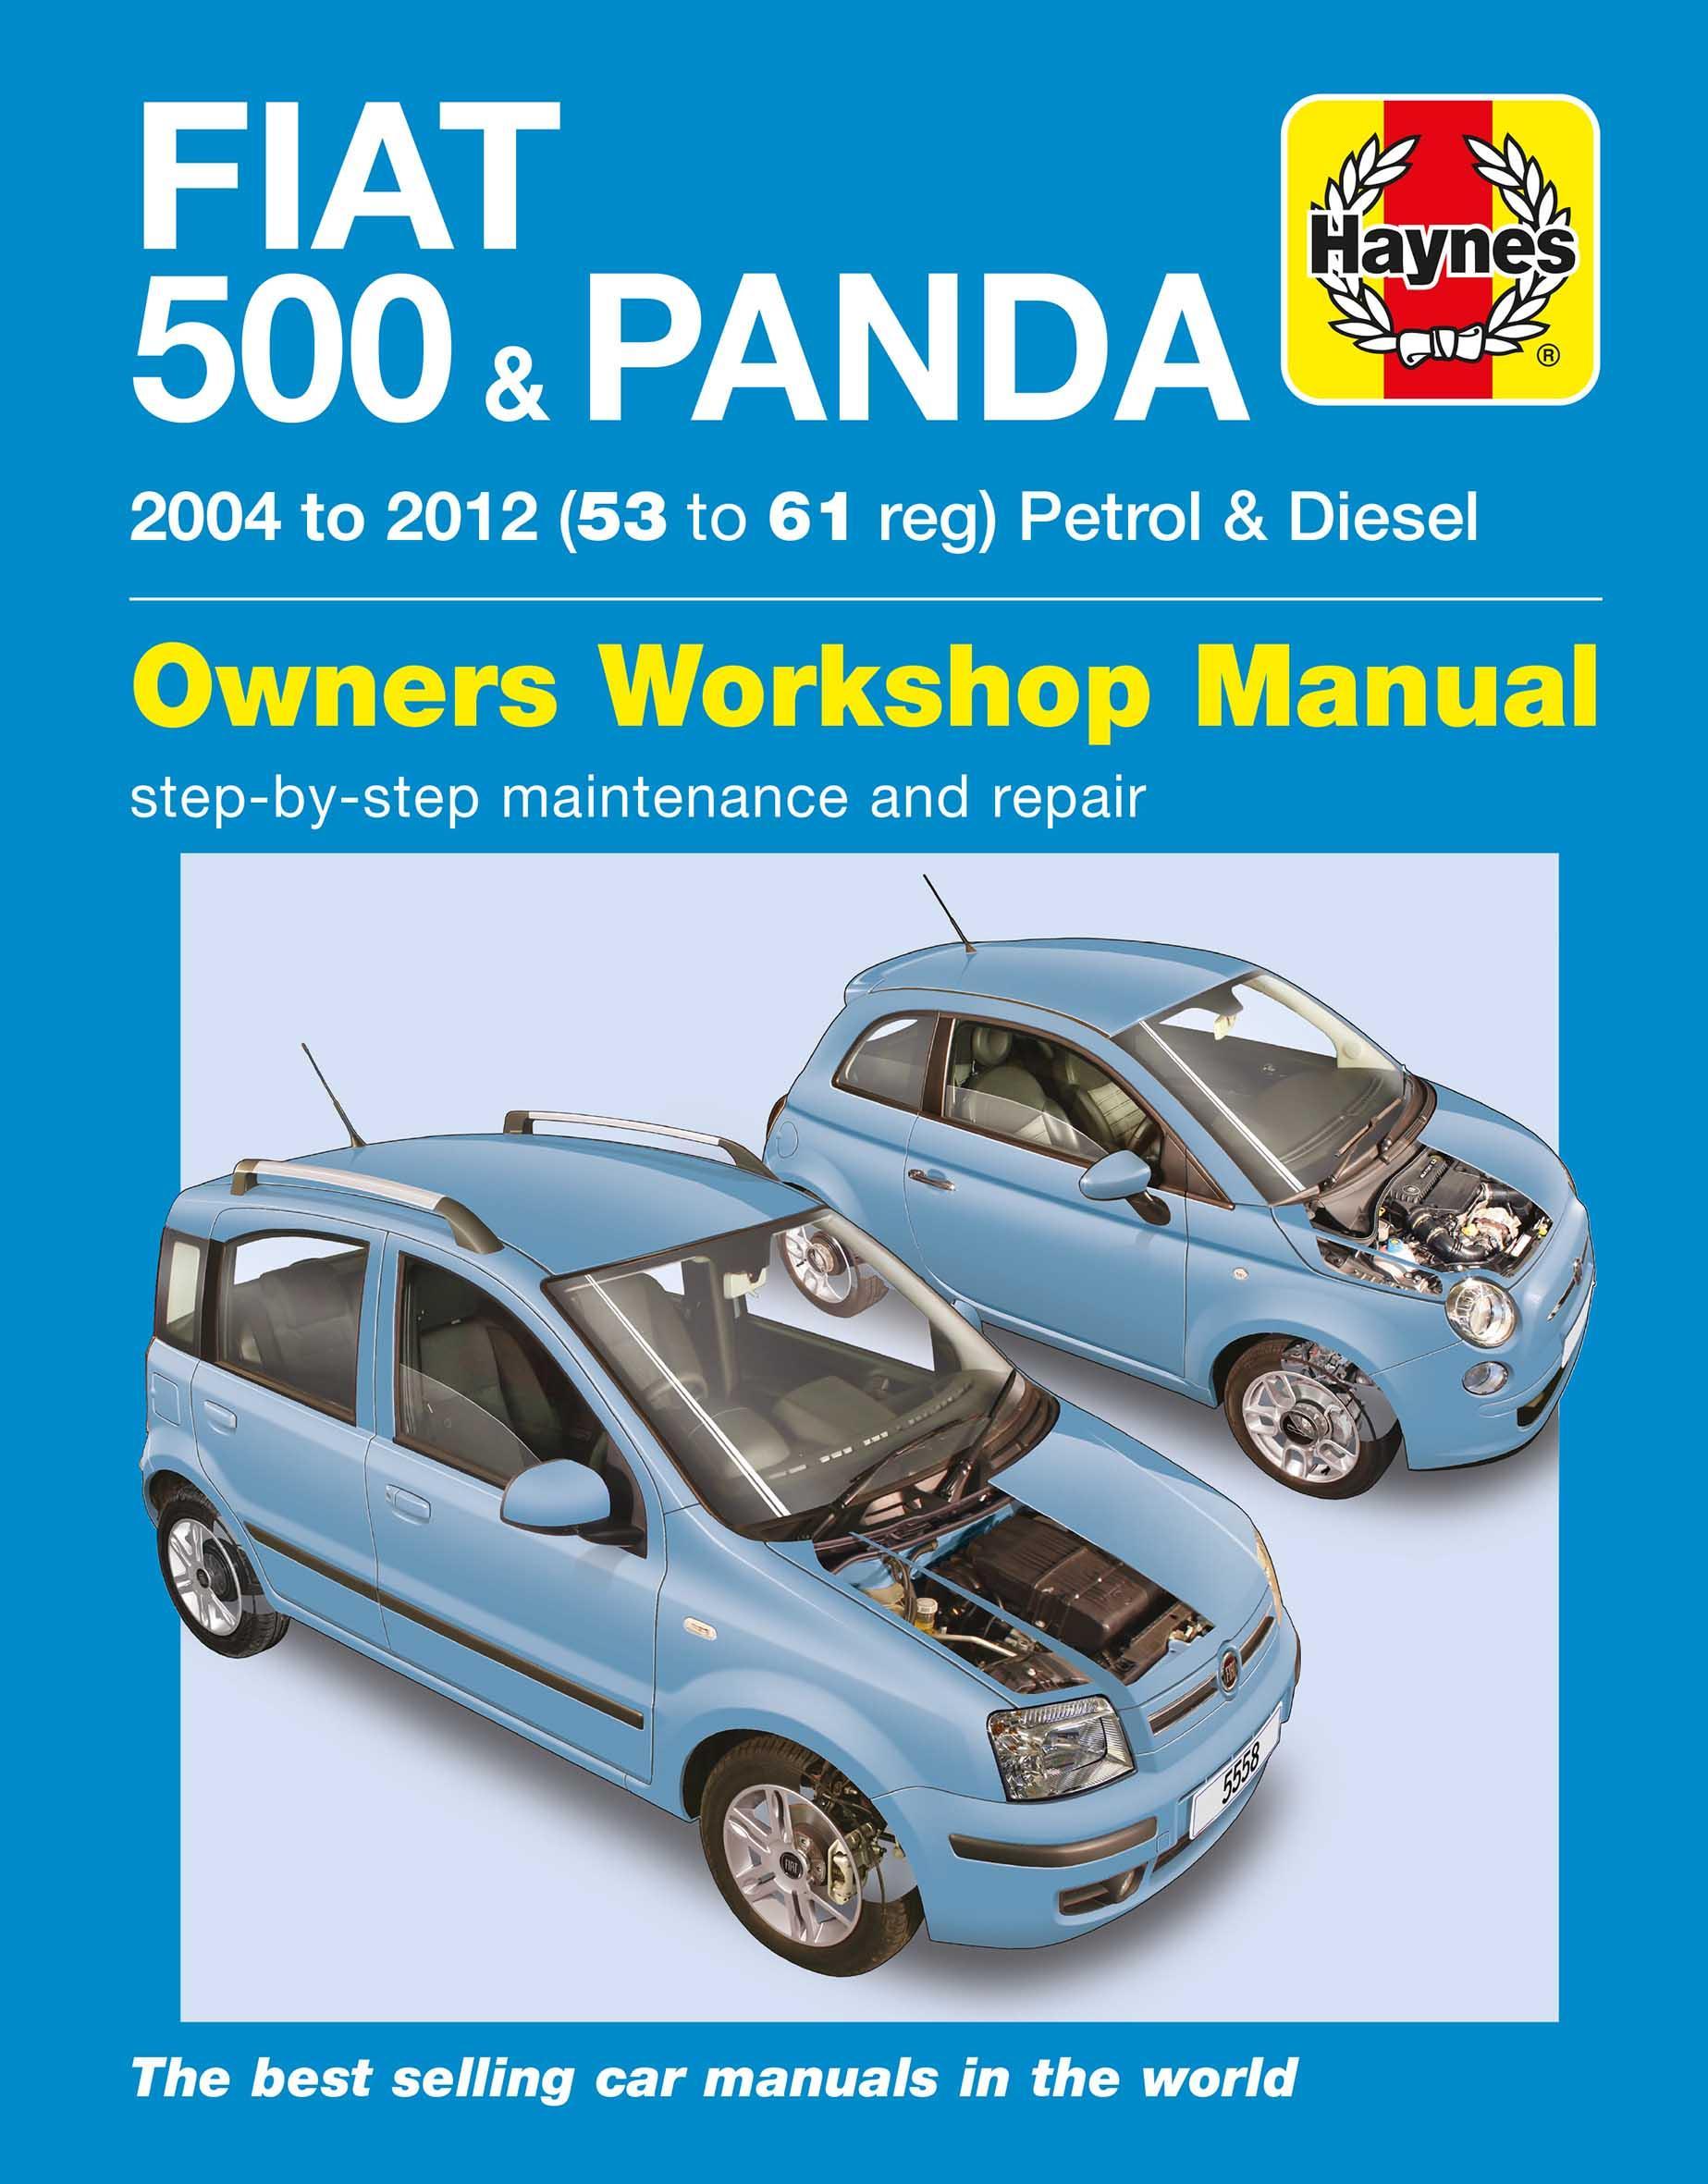 workshop manual fiat panda open source user manual u2022 rh dramatic varieties com Store Workshop Manual Store Workshop Manual